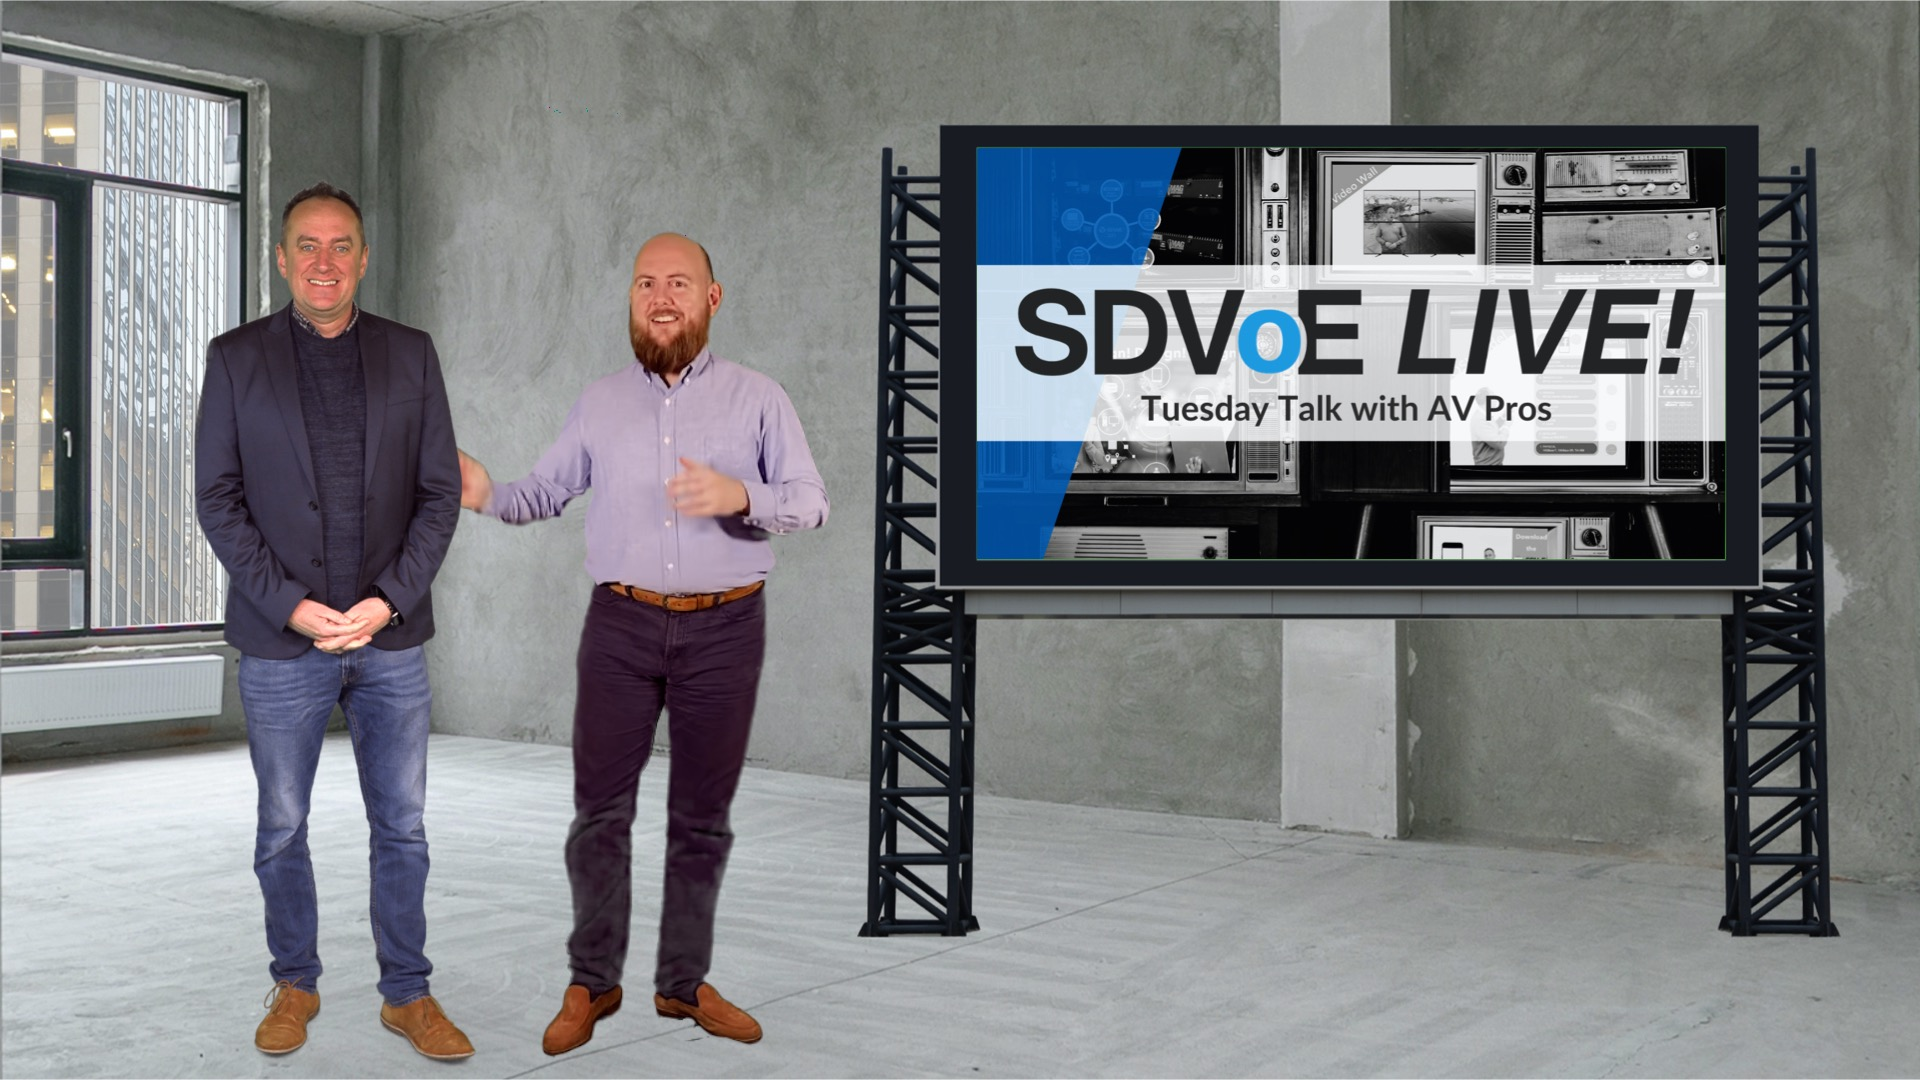 SDVoE LIVE! Episode 13: Digital Canvas the Modern Classroom